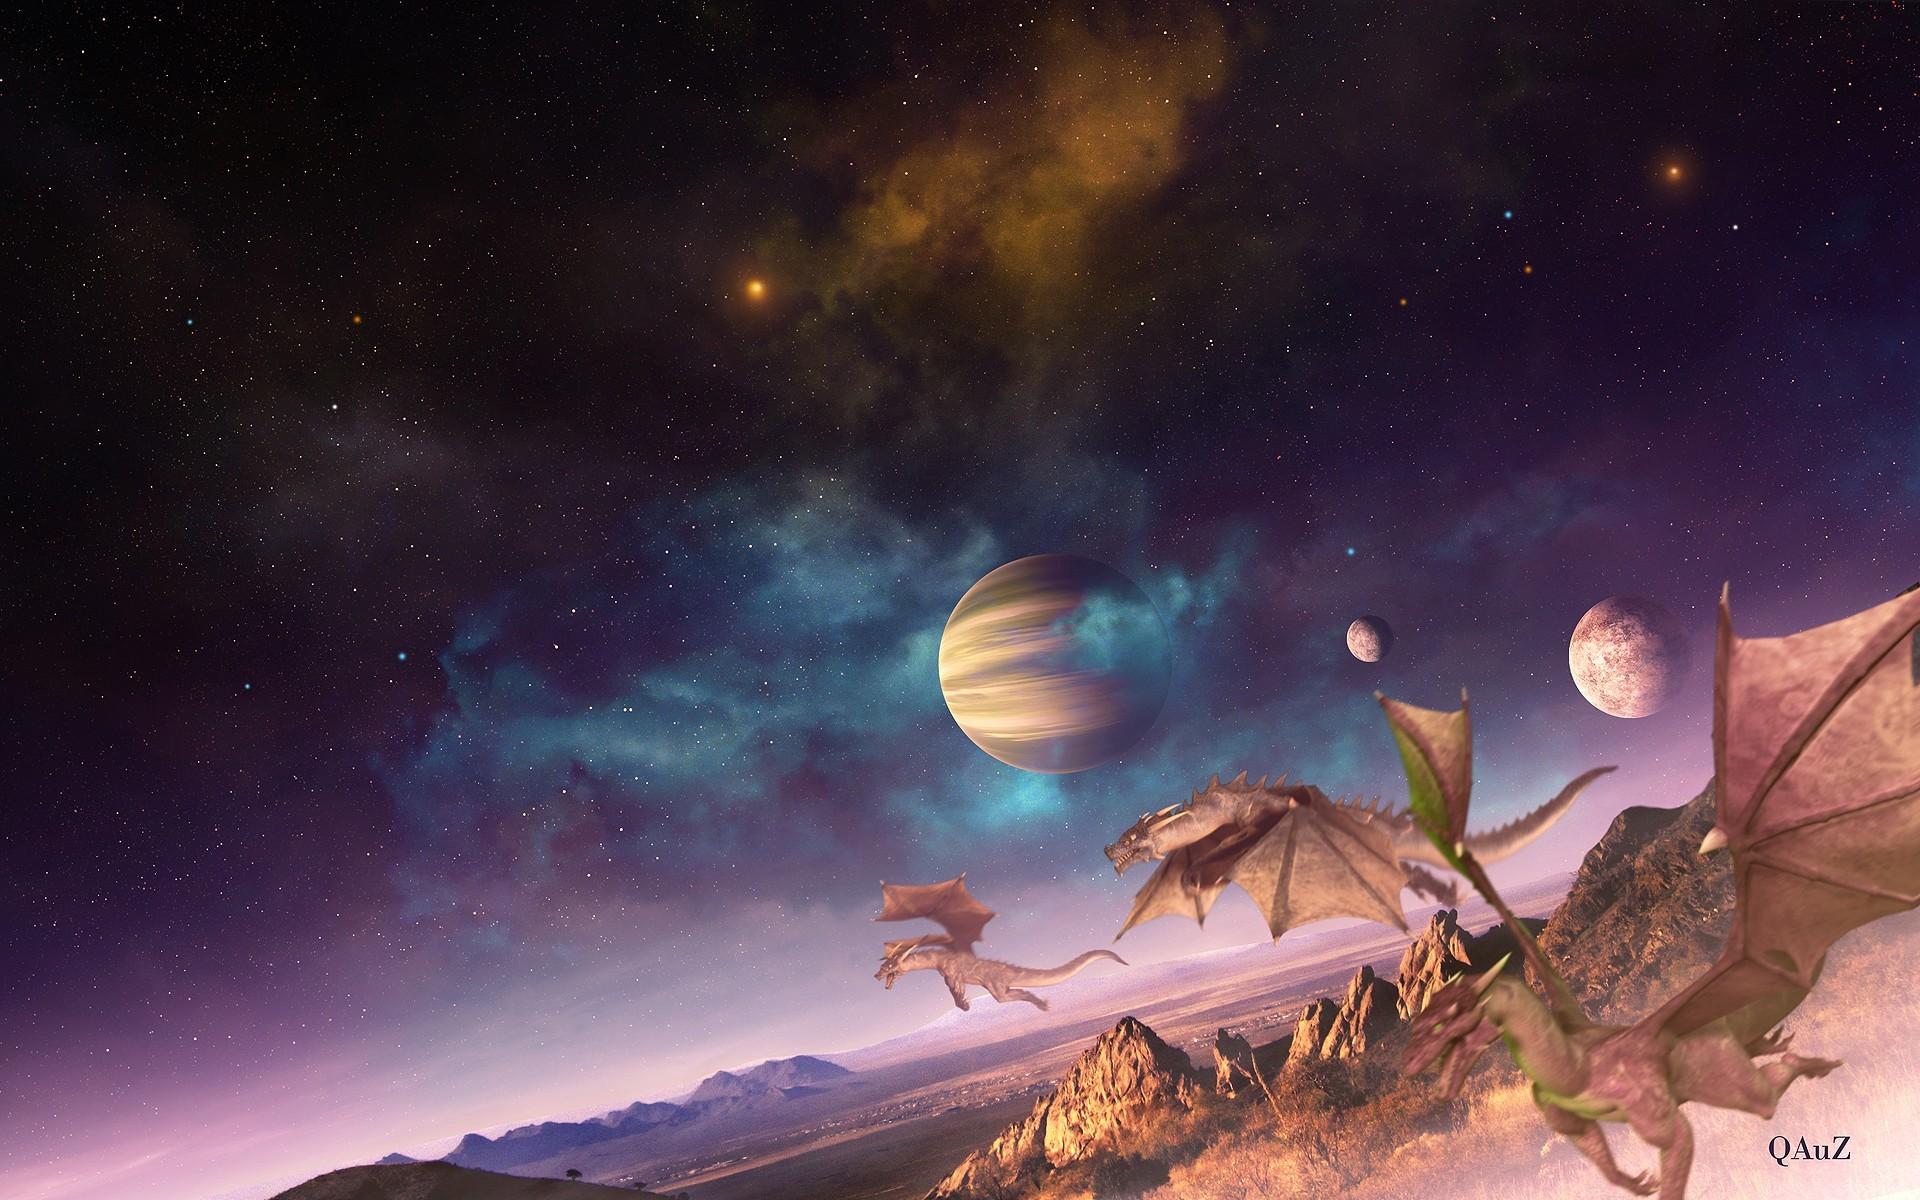 Res: 1920x1200, Outer space fantasy art digital art creatures dragons fantasy planets  landscapes wallpaper |  | 58929 | WallpaperUP